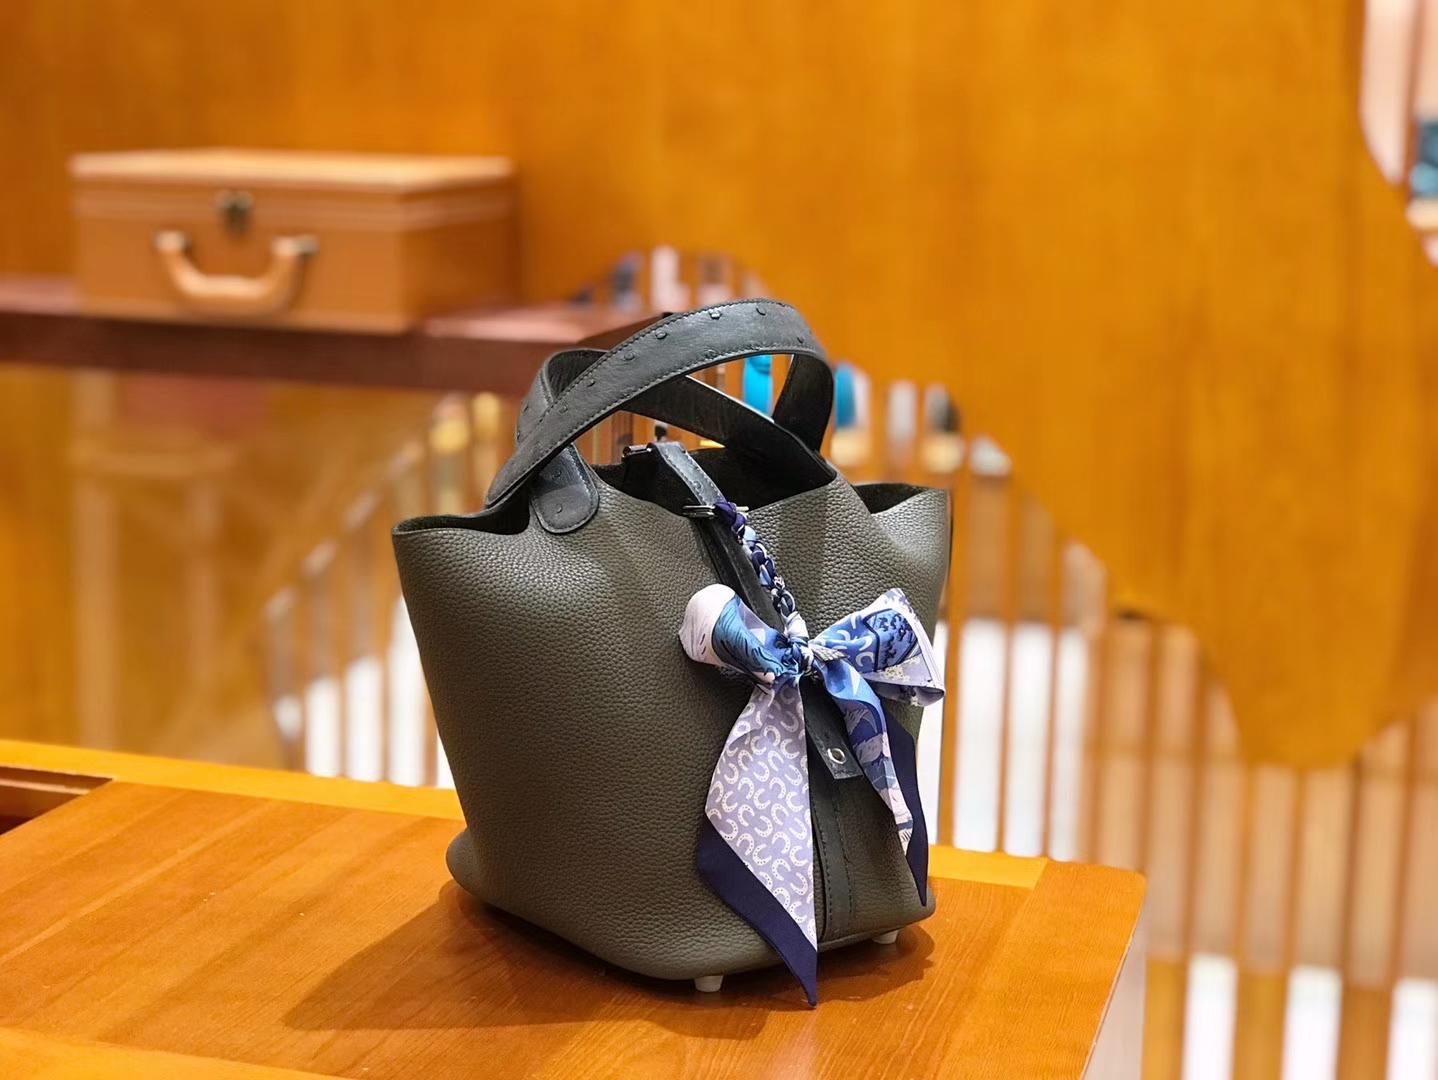 Hermès(爱马仕)Piction 18cm 鸵鸟拼牛皮 锡器灰 全手工缝制